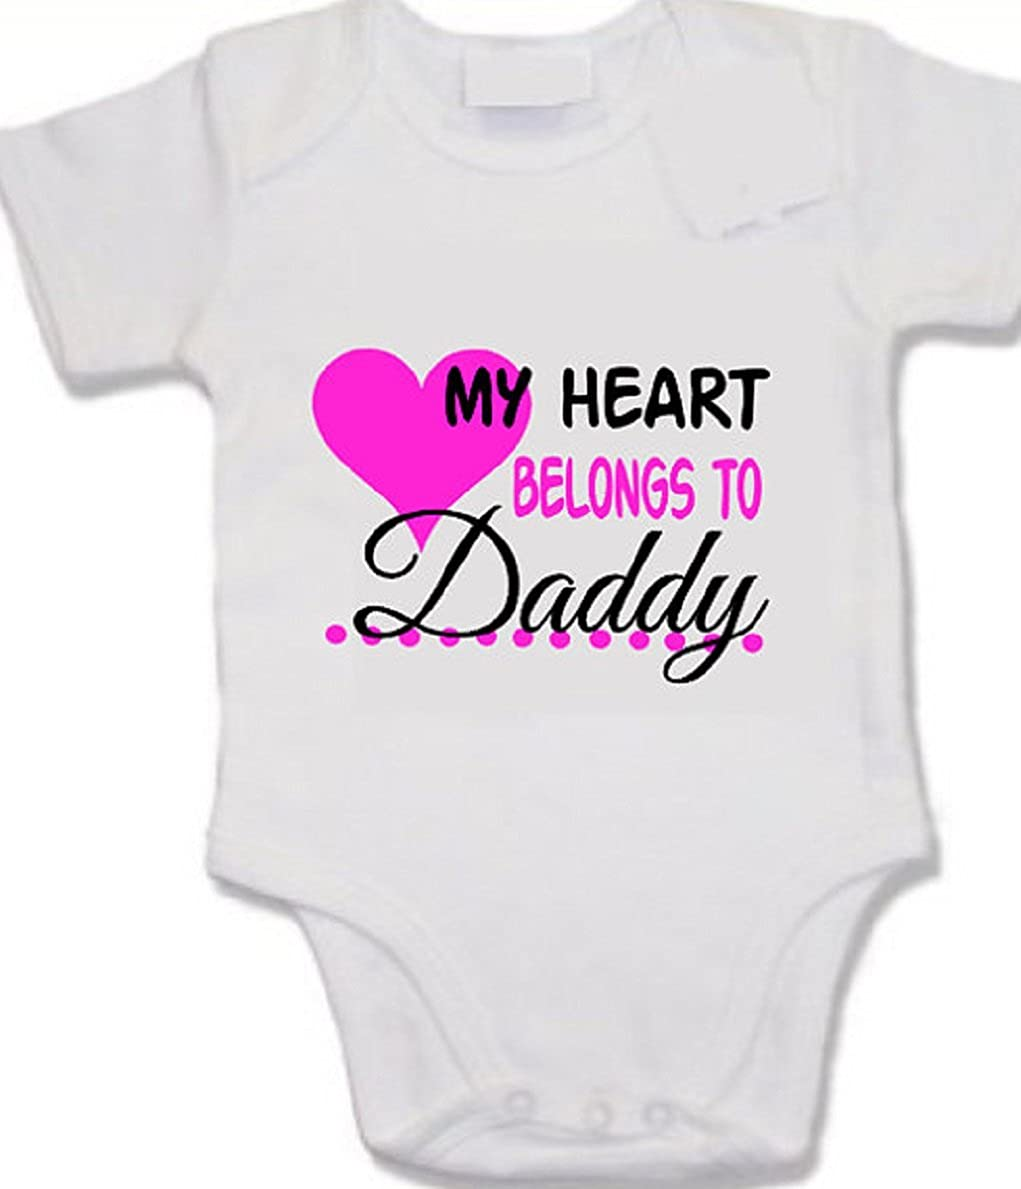 My heart belongs to Daddy print baby vest valentine's day first valentine cute daddy's girl